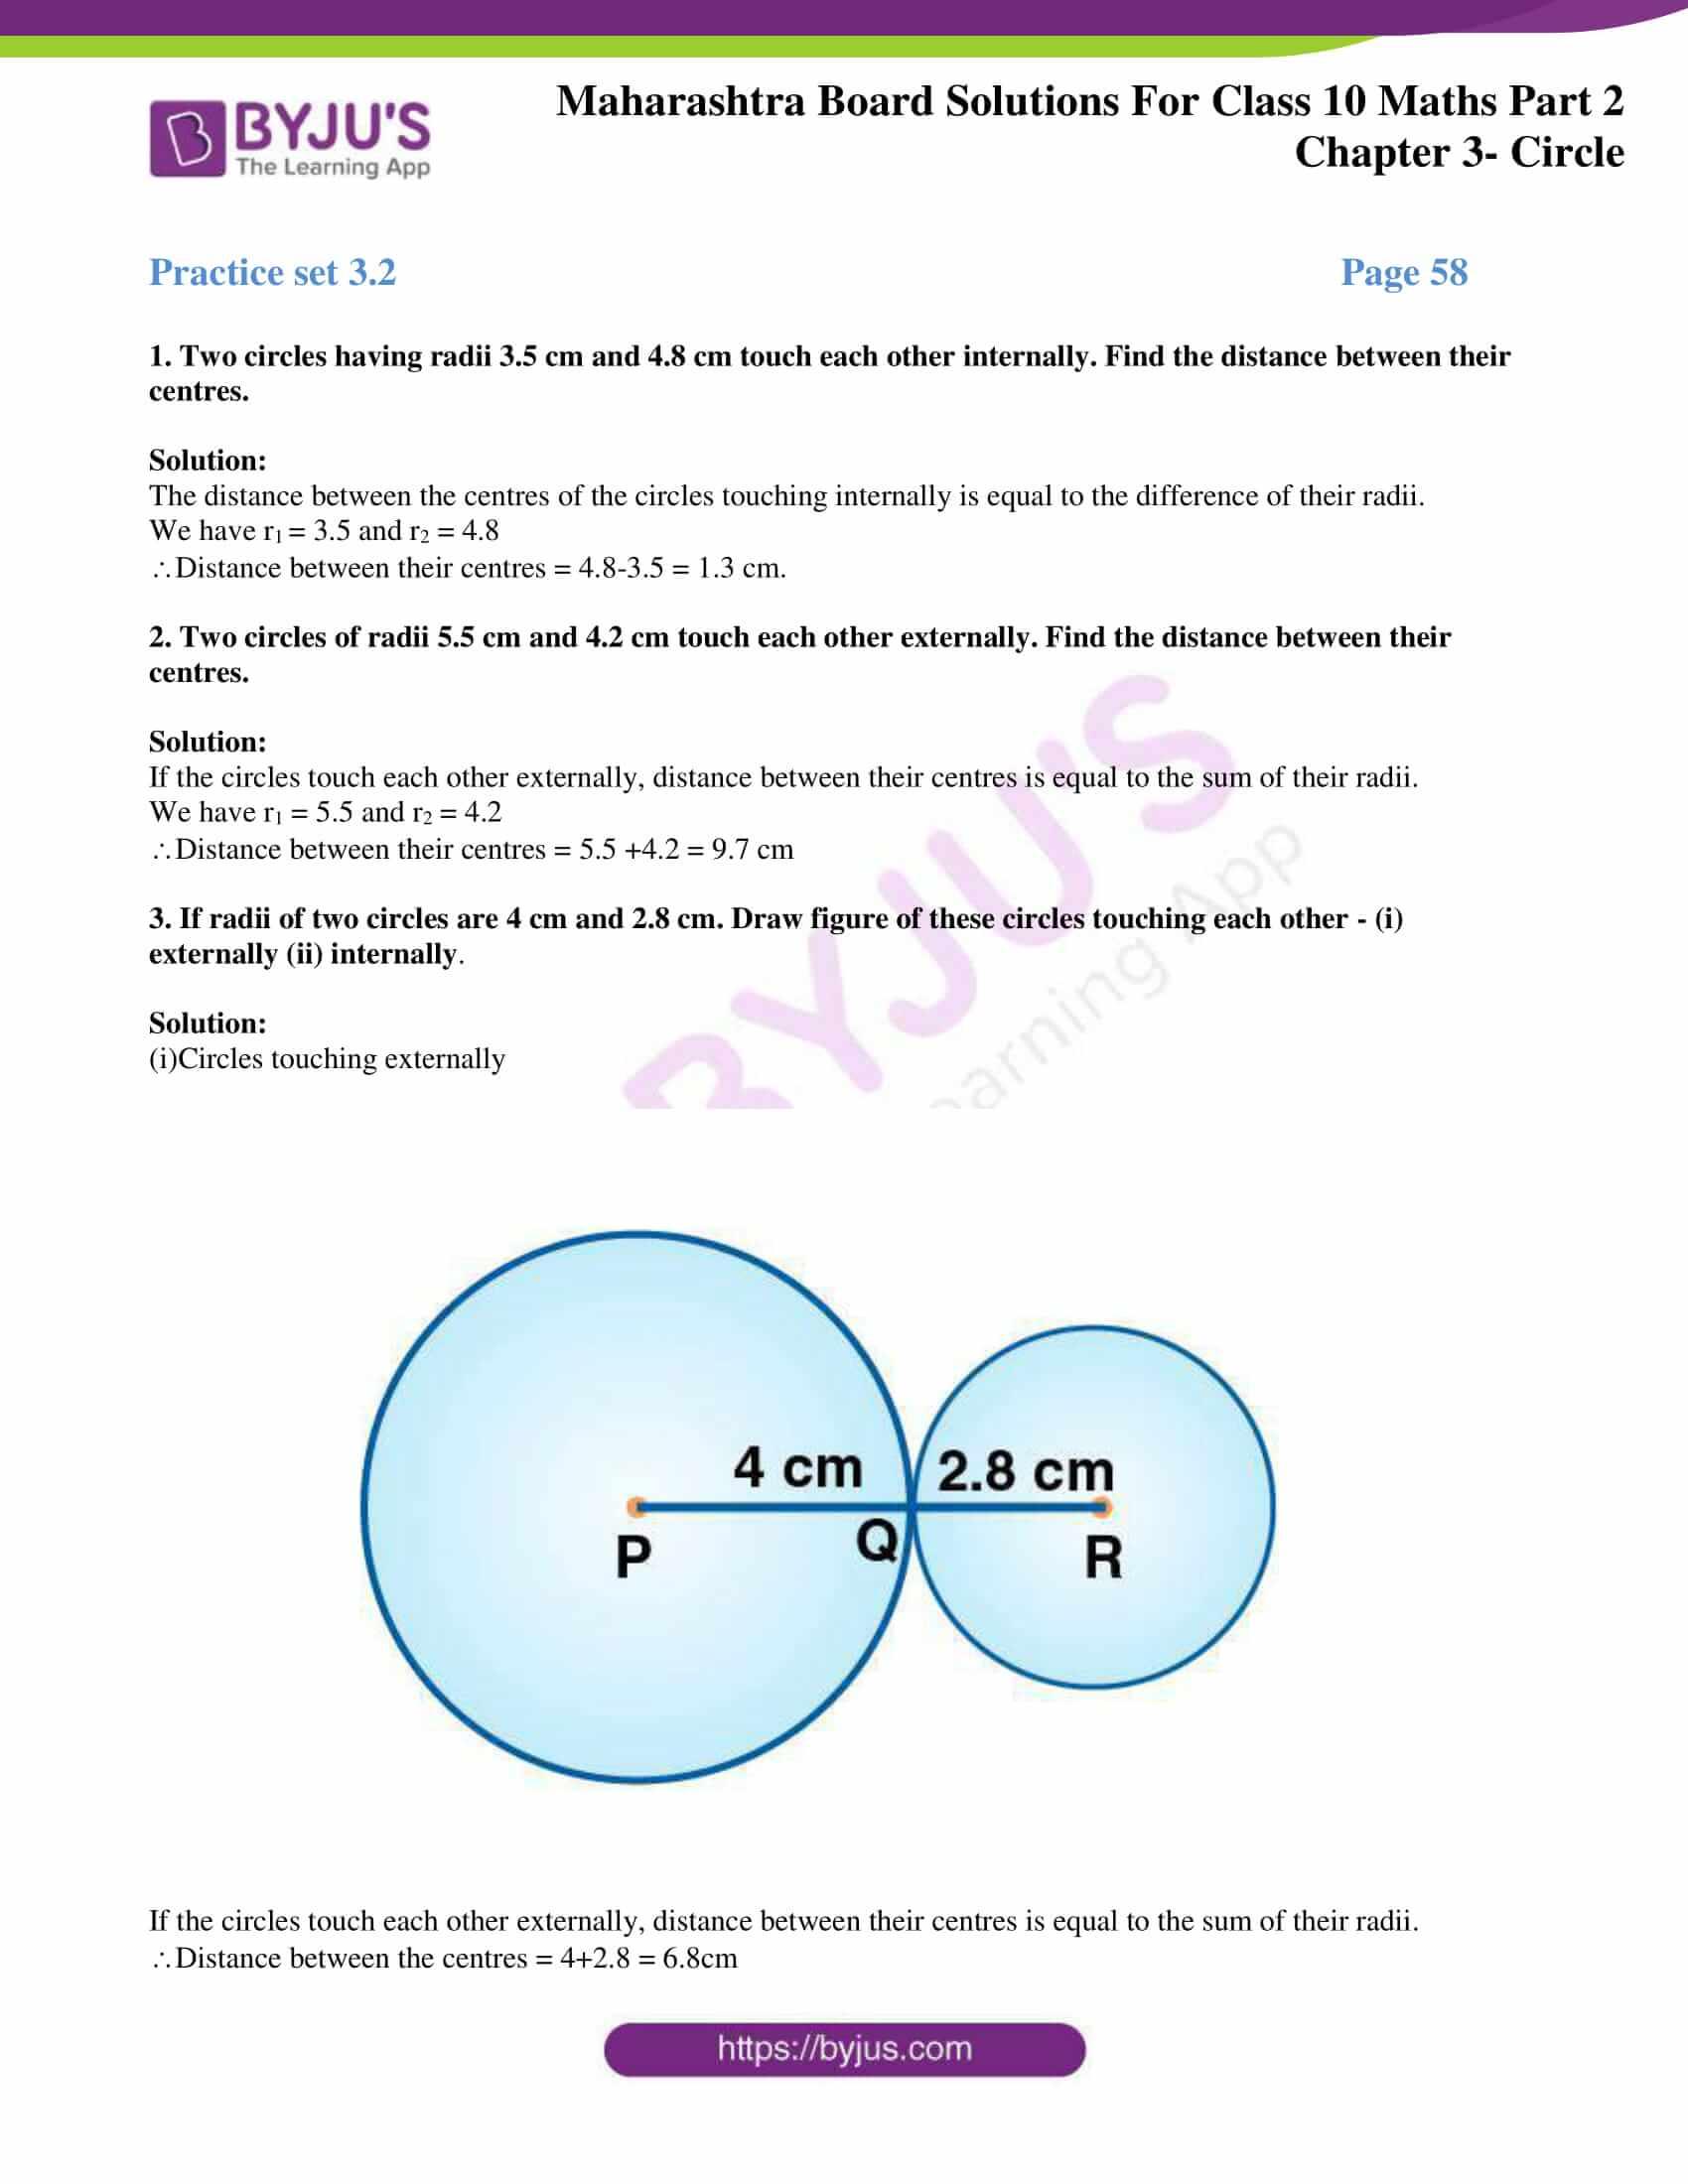 msbshse sol class 10 maths part 2 chapter 3 05